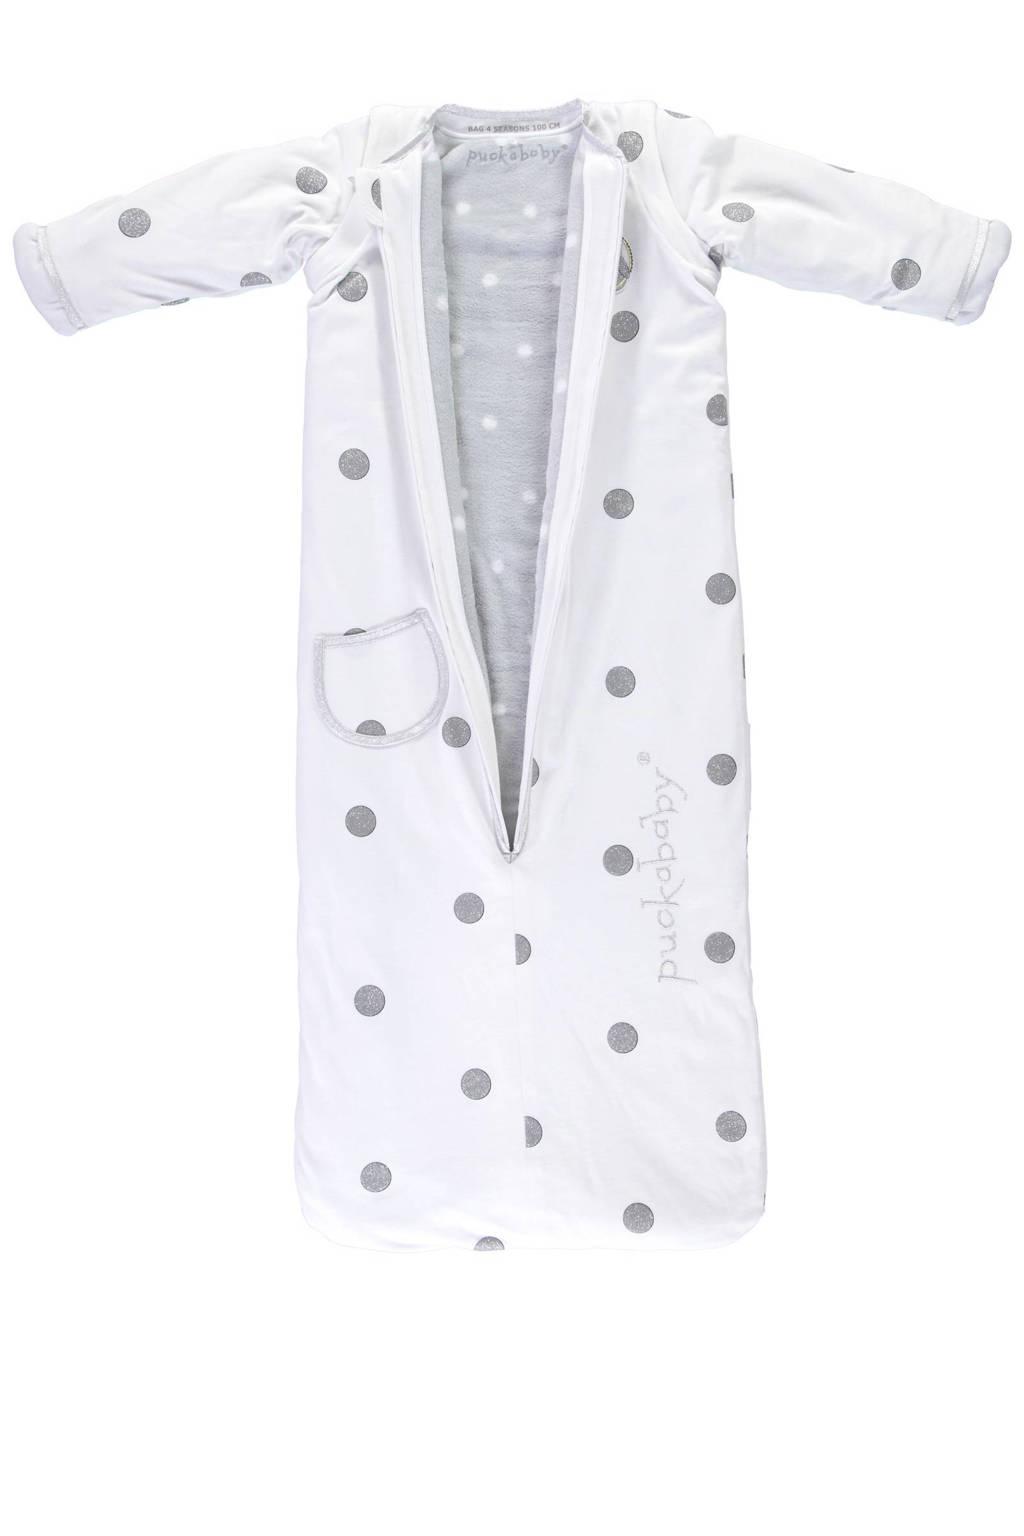 Puckababy The Bag 4 Seasons slaapzak 6-30 mnd white dotty, White dotty